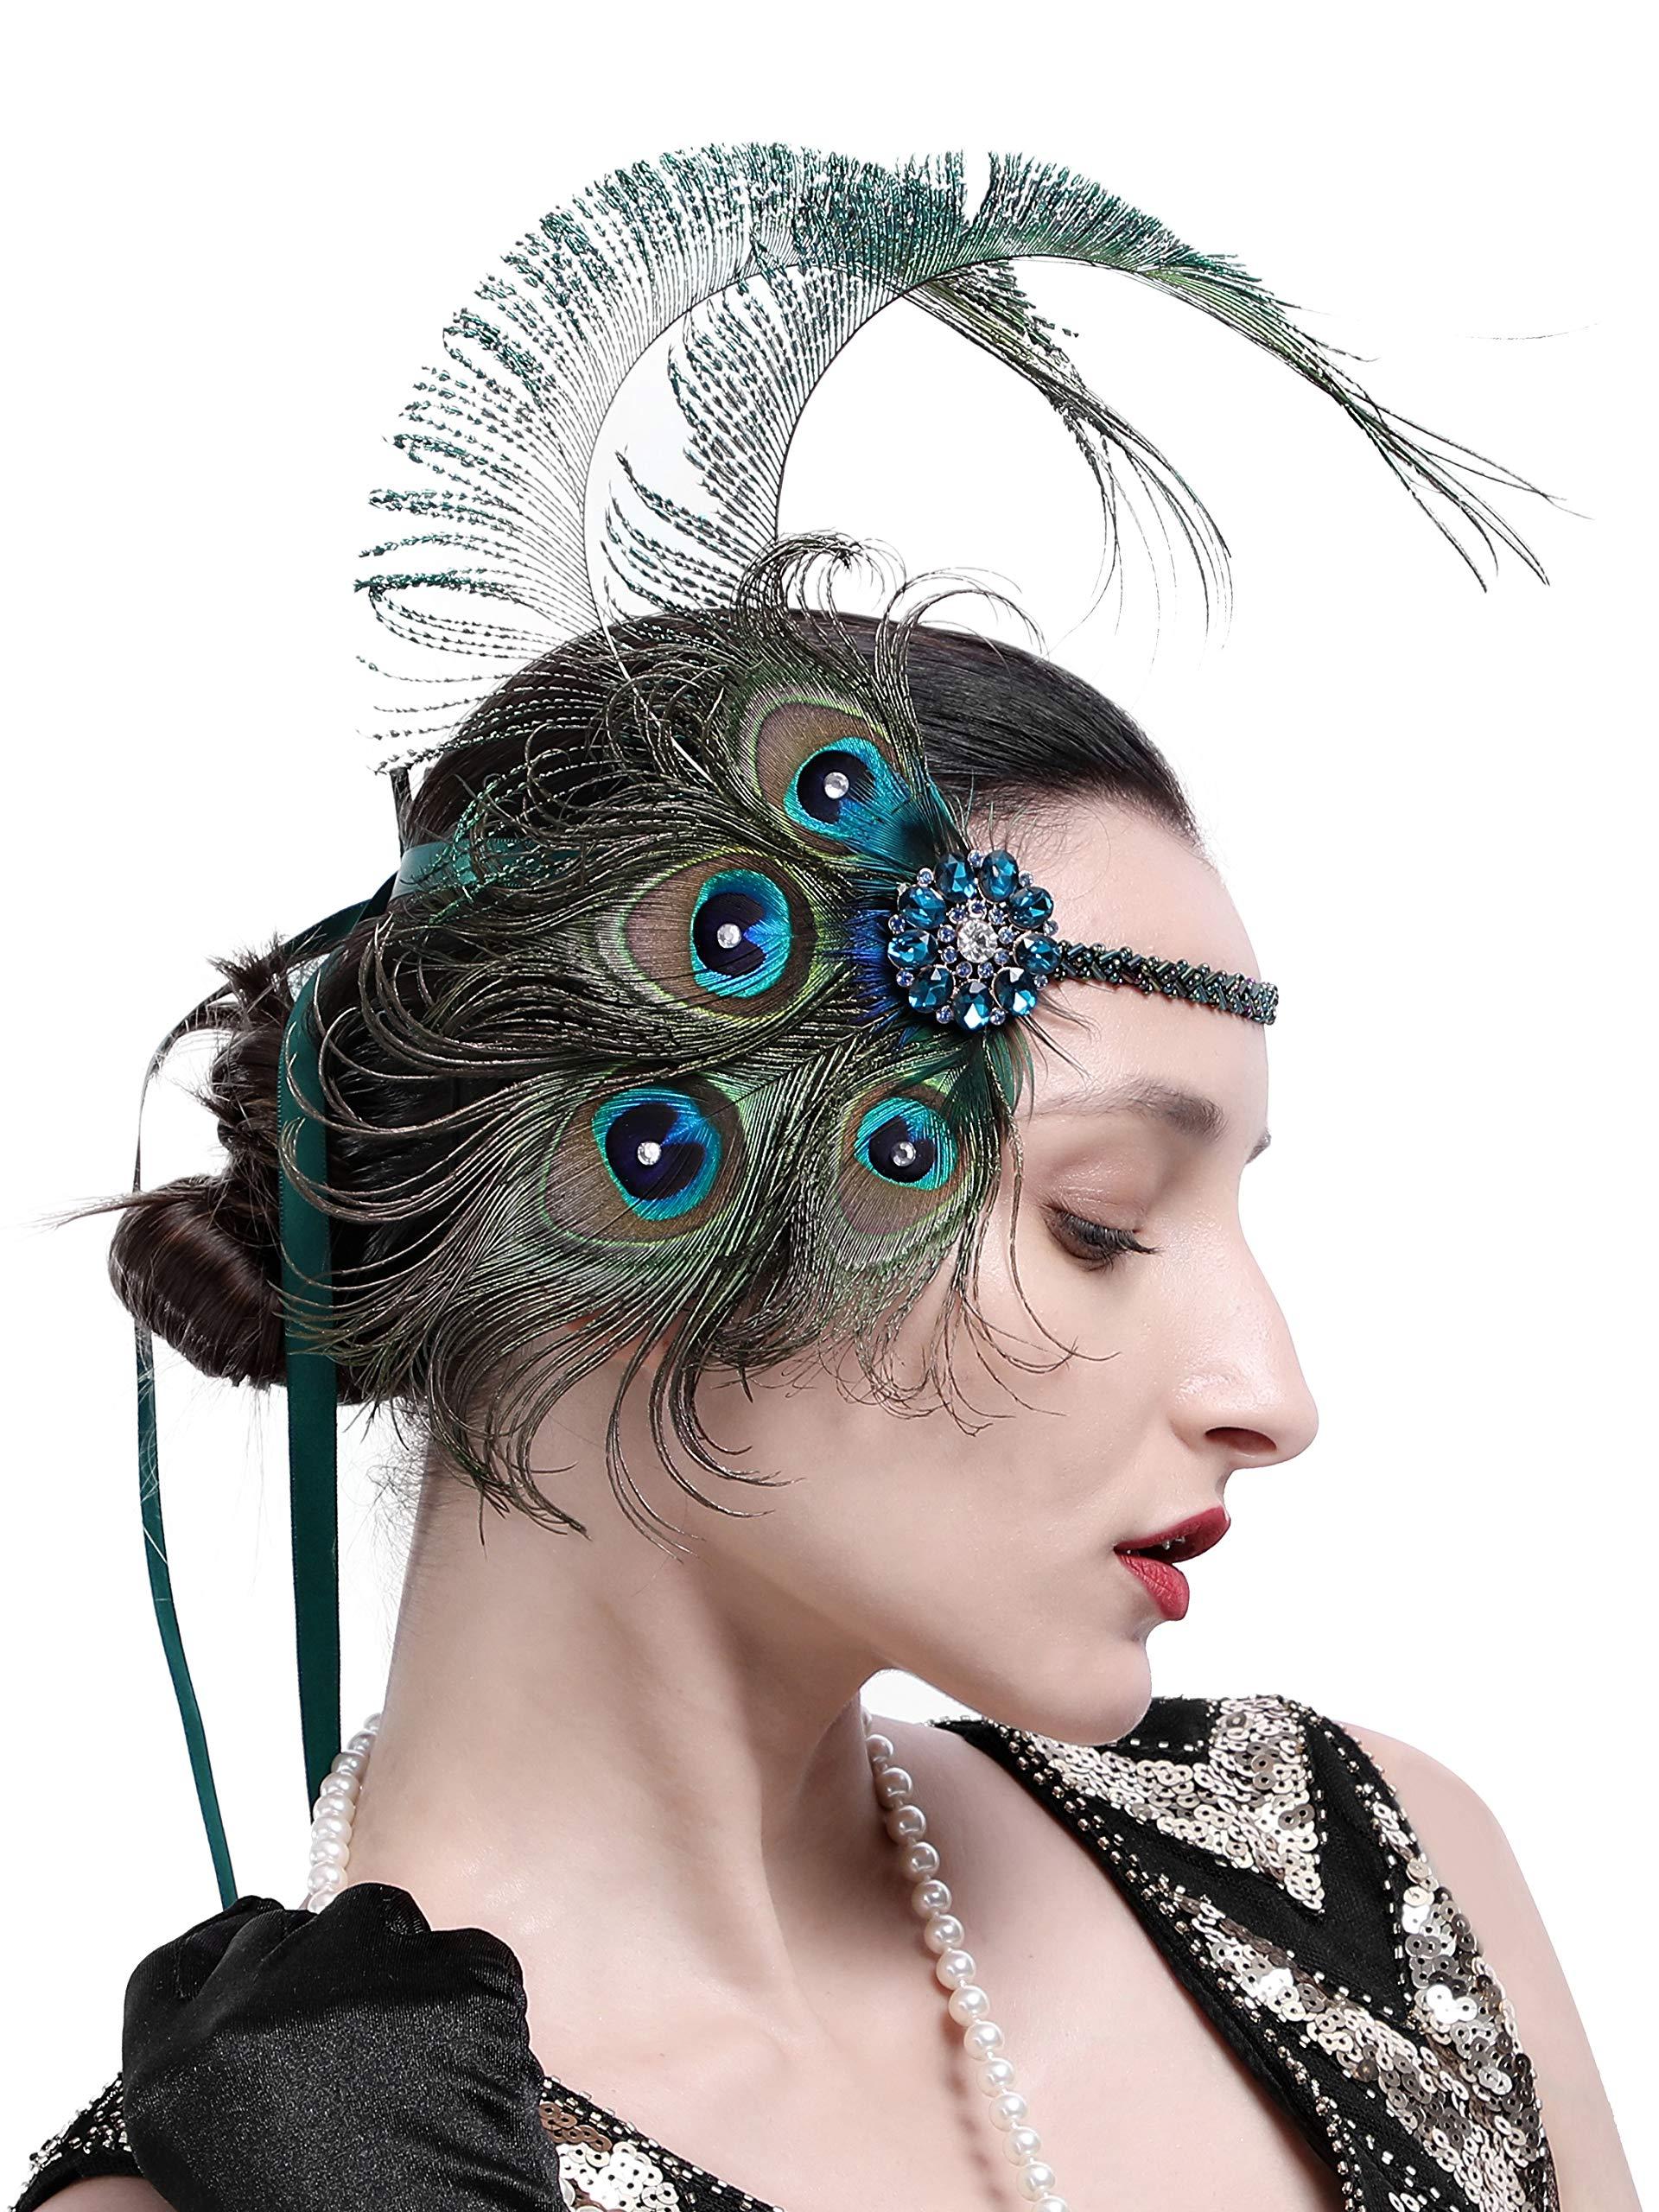 Zivyes 1920s Accessories Peacock Feather Headband Women's Costume Headwear Hat Accessories Flapper Wedding Headpiece